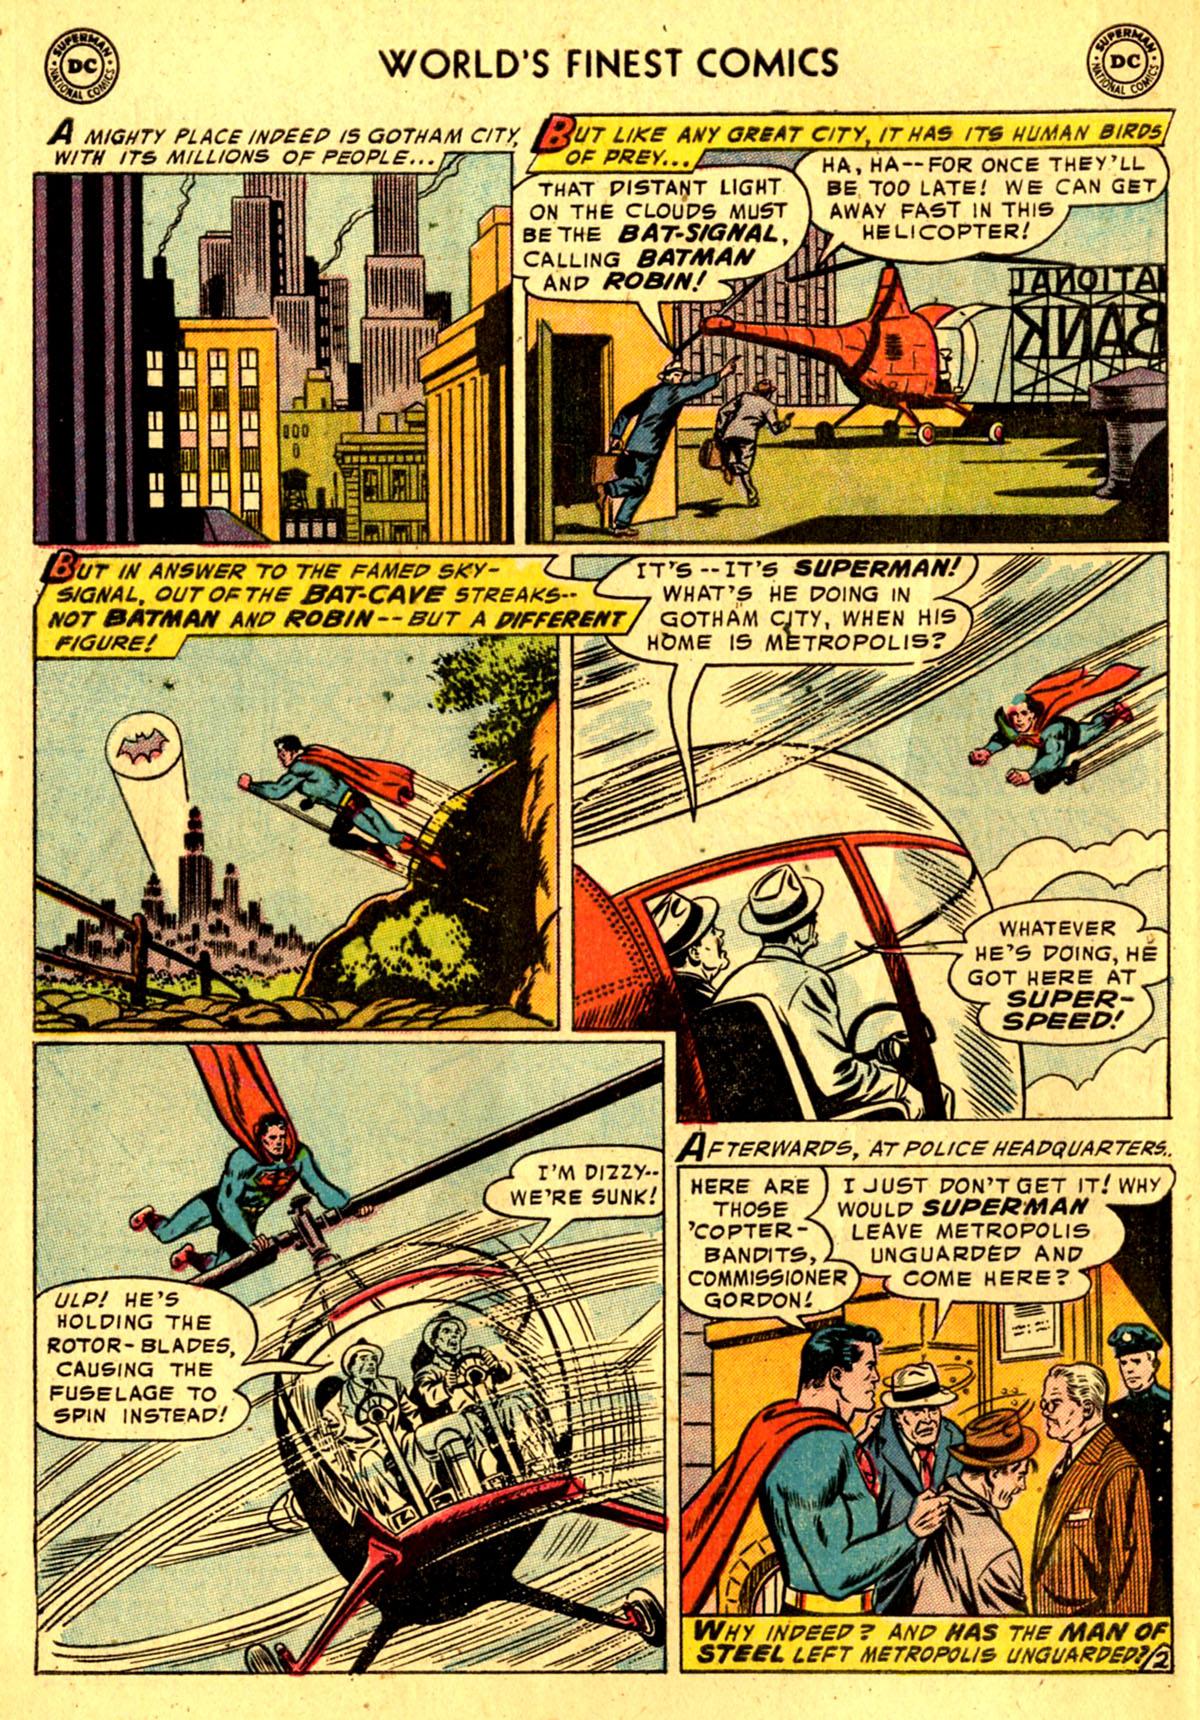 Read online World's Finest Comics comic -  Issue #76 - 4